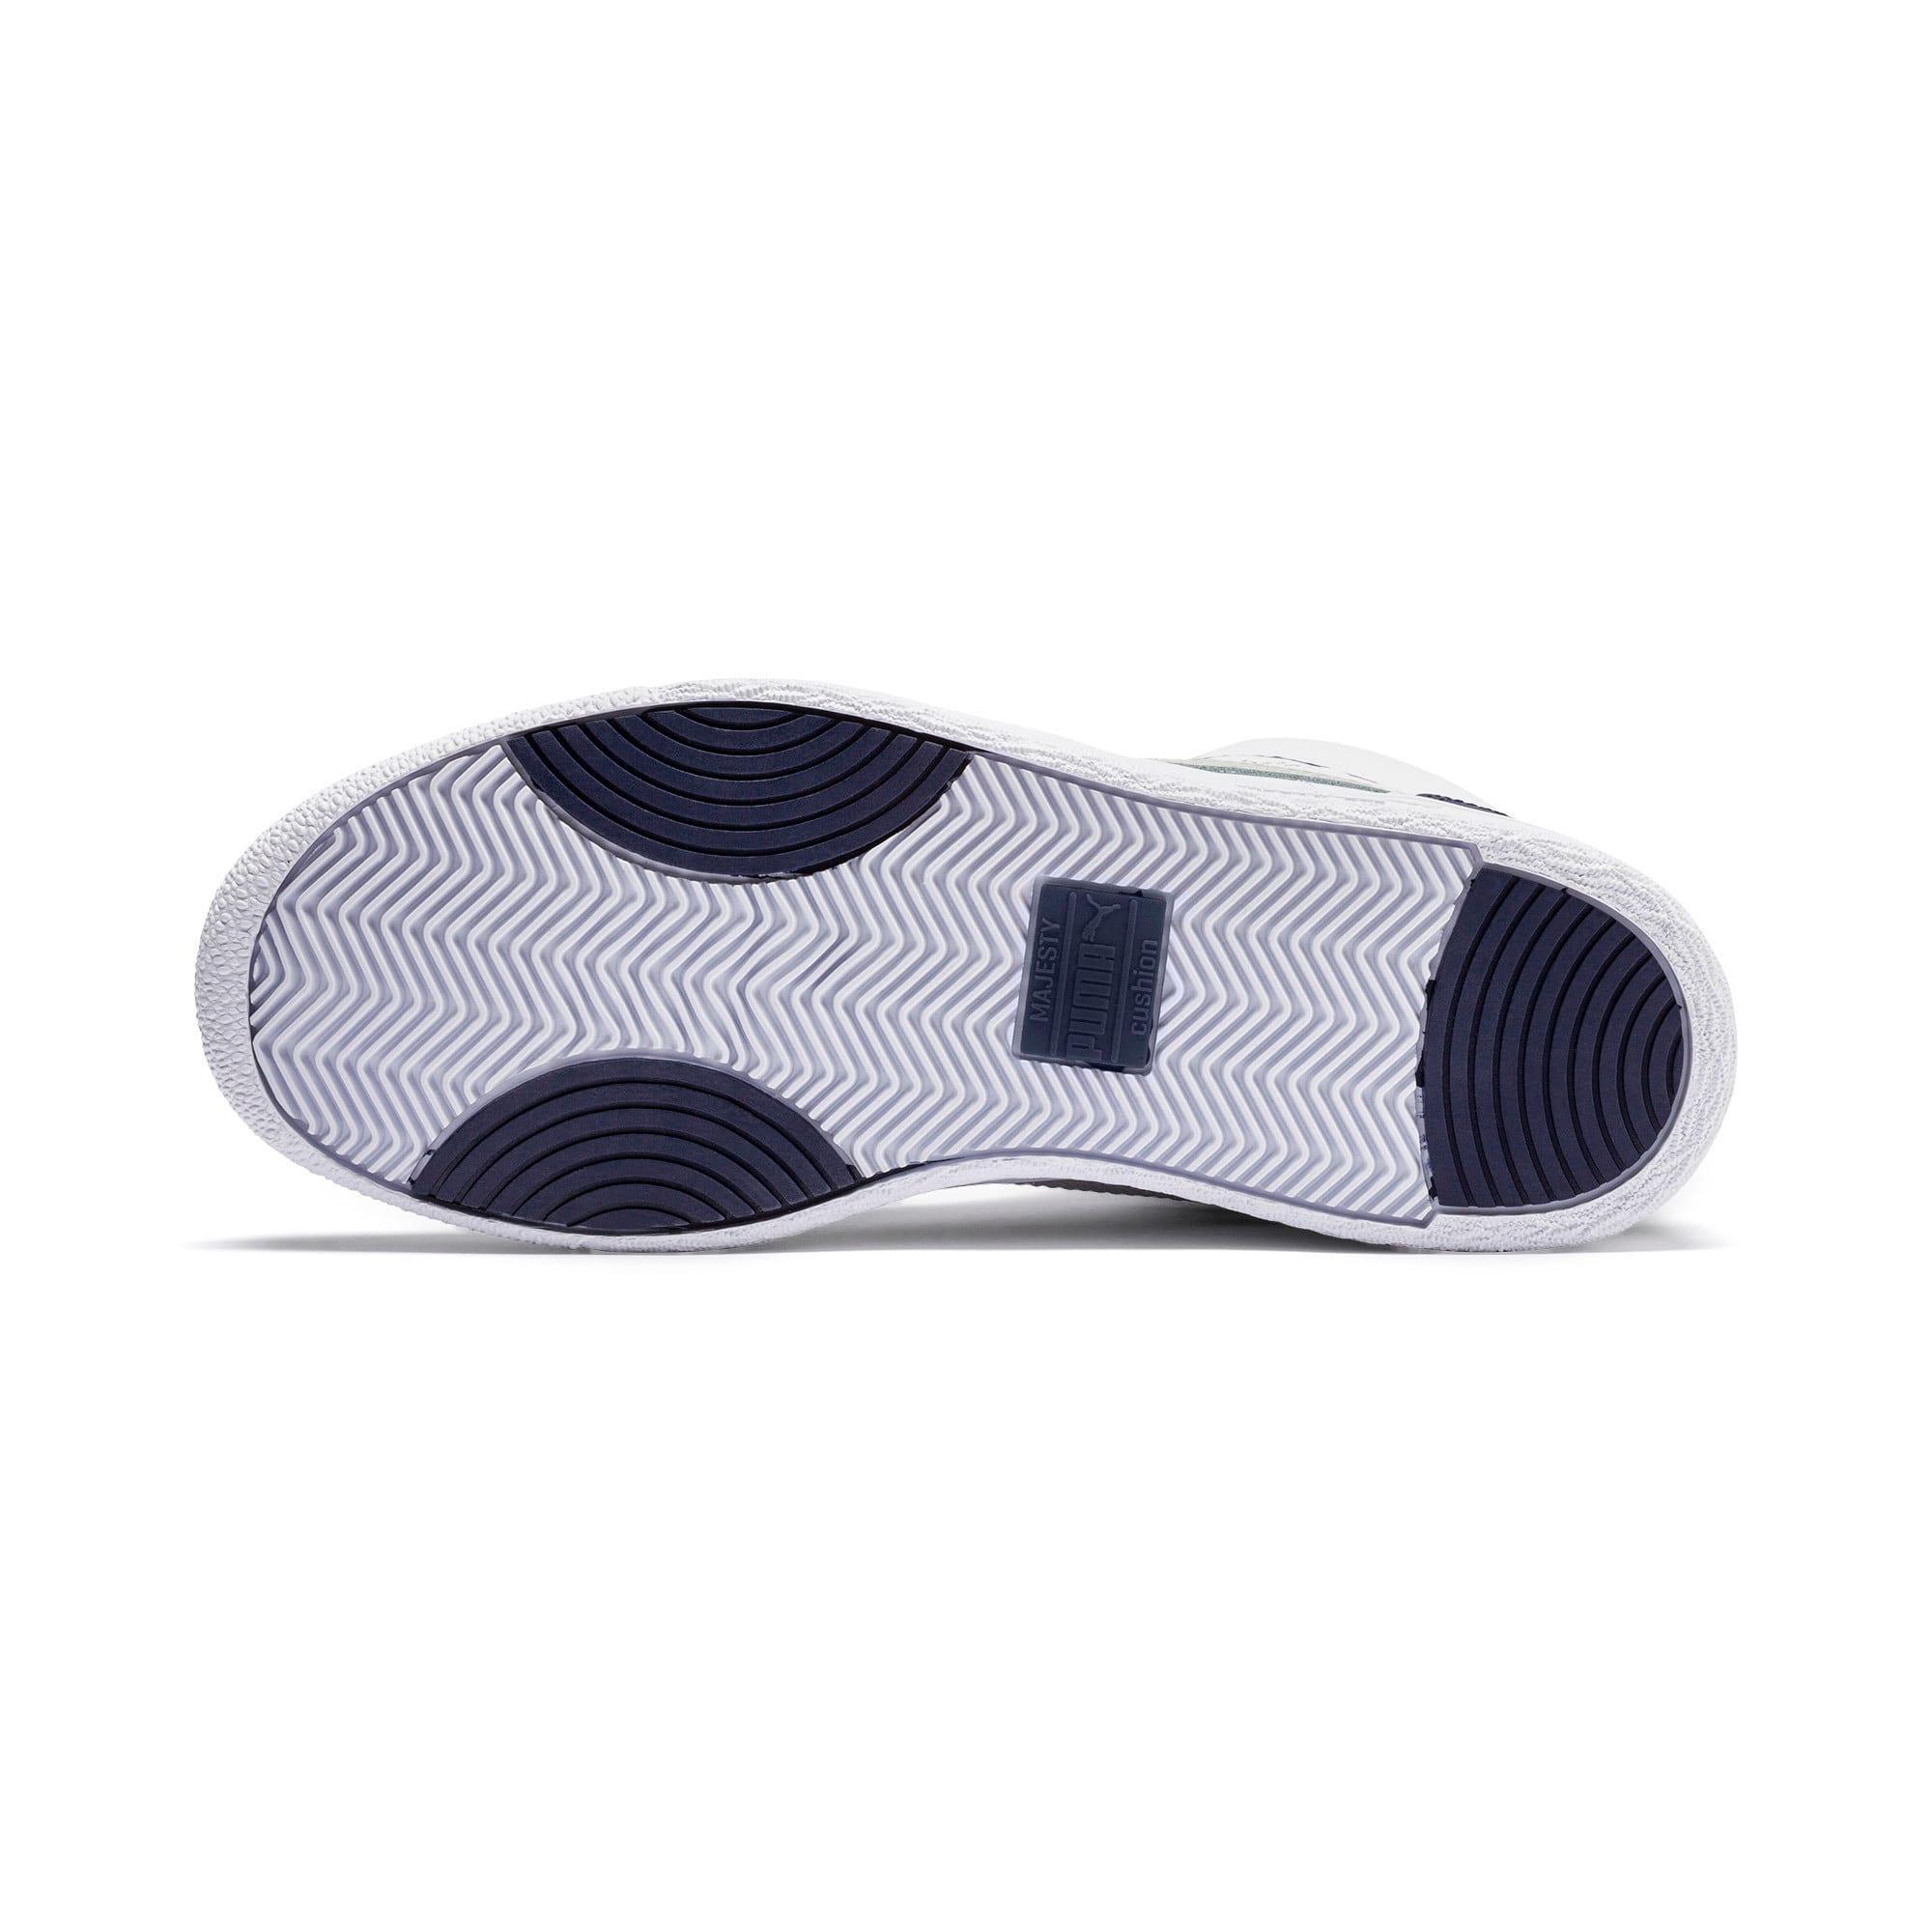 Thumbnail 4 of Ralph Sampson Mid Sneakers, P White-Gray Violet-Peacoat, medium